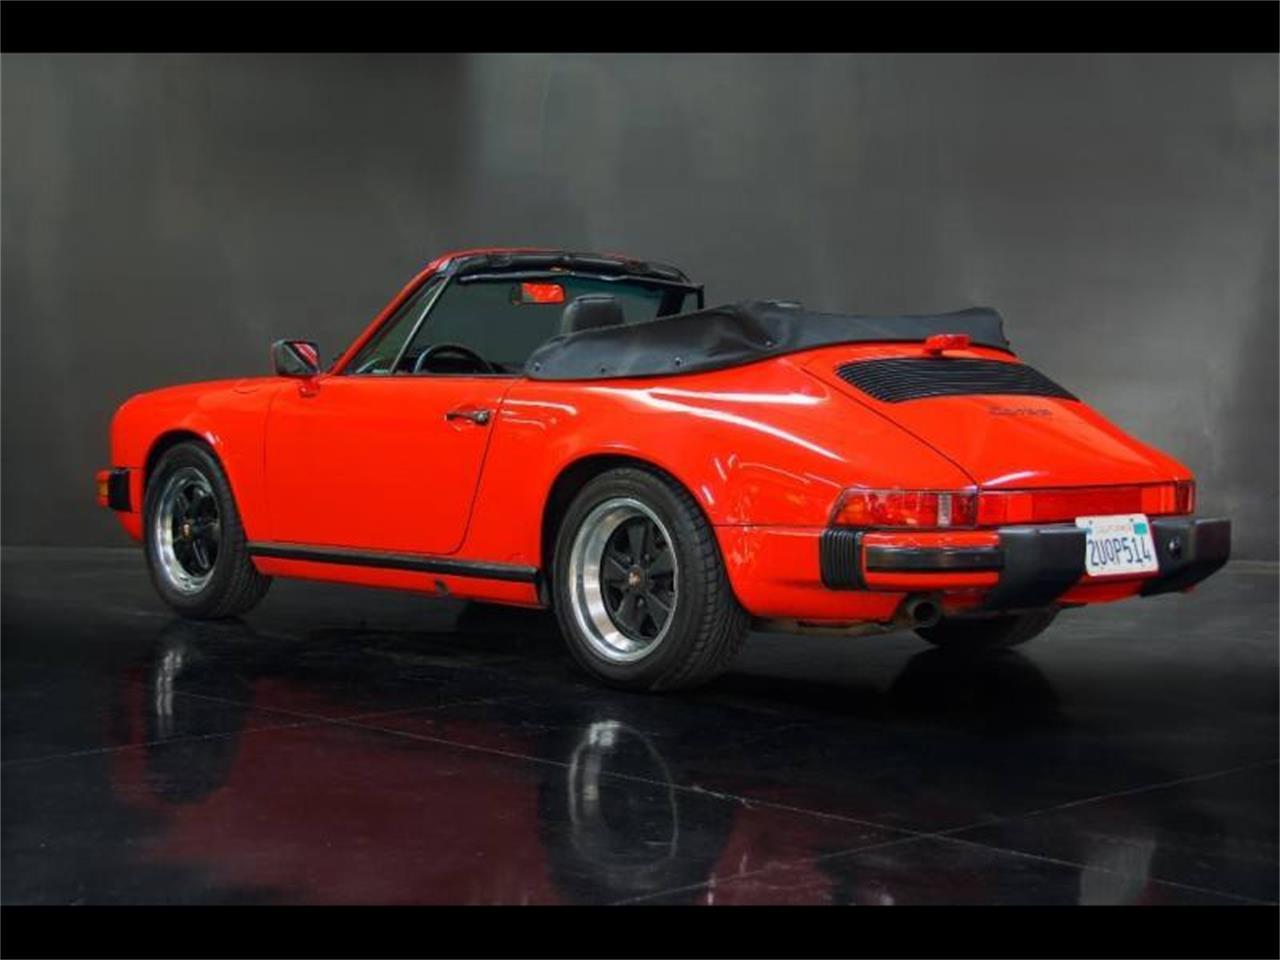 1989 Porsche 911 Carrera (CC-1033745) for sale in Milpitas, California